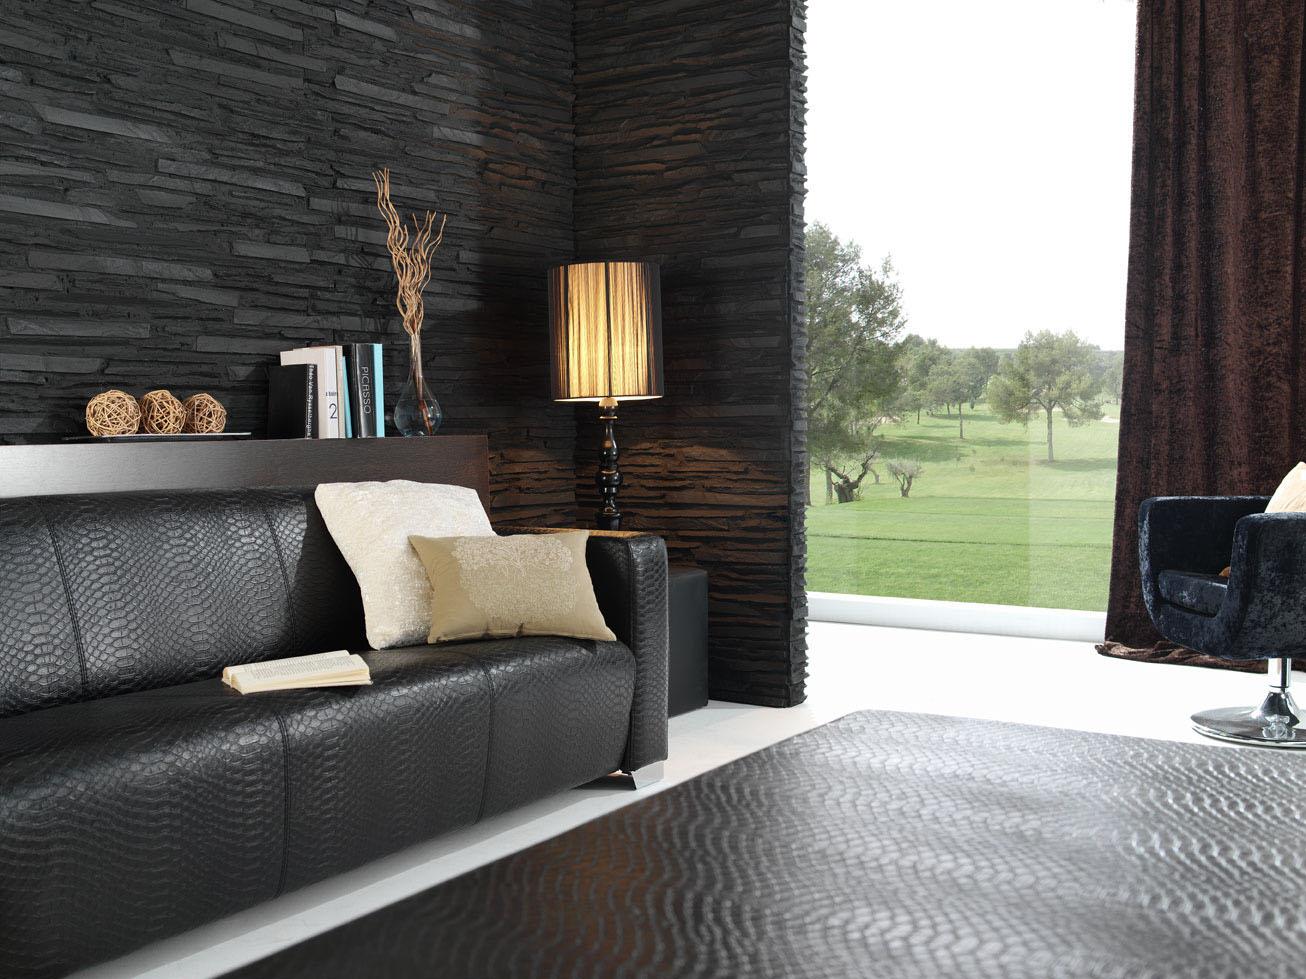 Home Interior Desing Panel Piedra Laja Fina Revestimiento Para Paredes